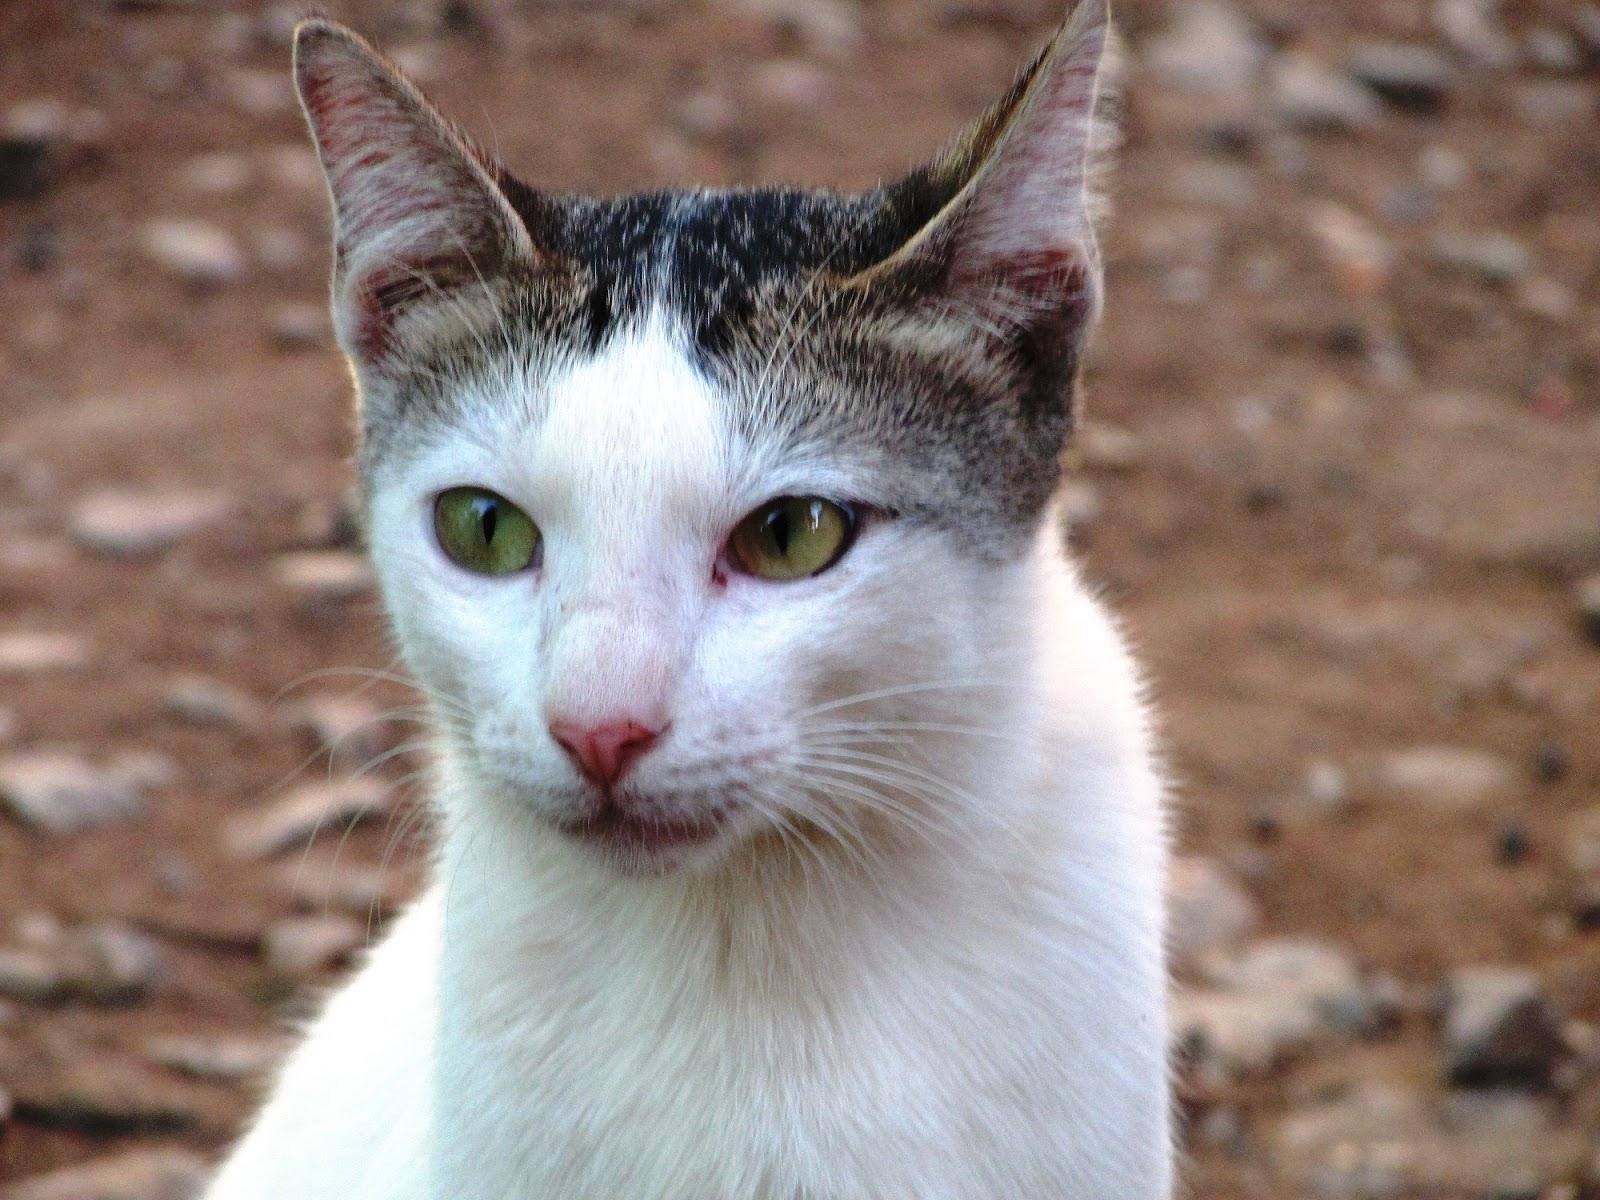 Kucing putih